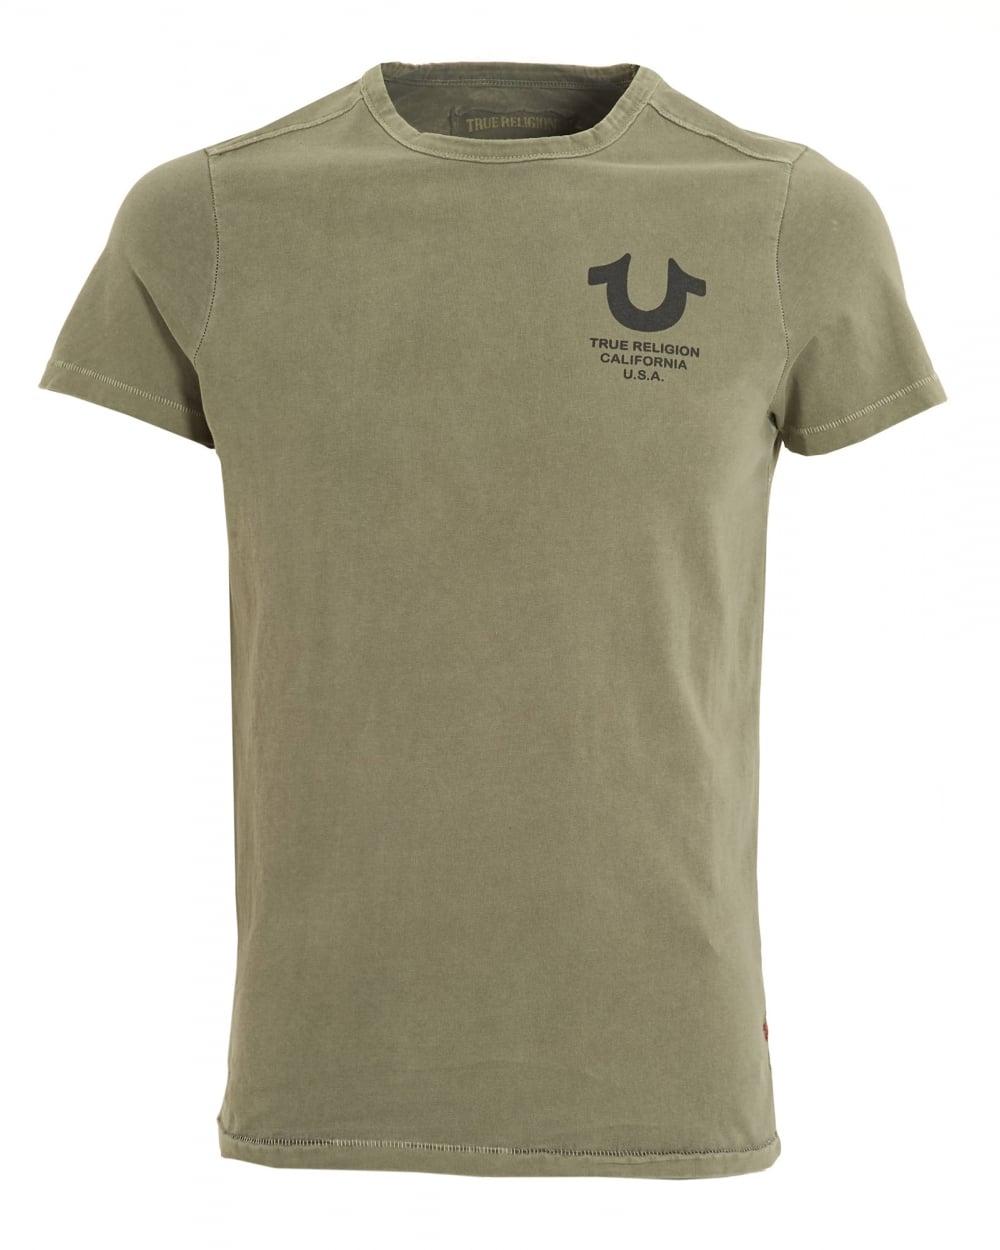 True Religion Mens California Usa T Shirt Crew Neck Dusty Olive Tee